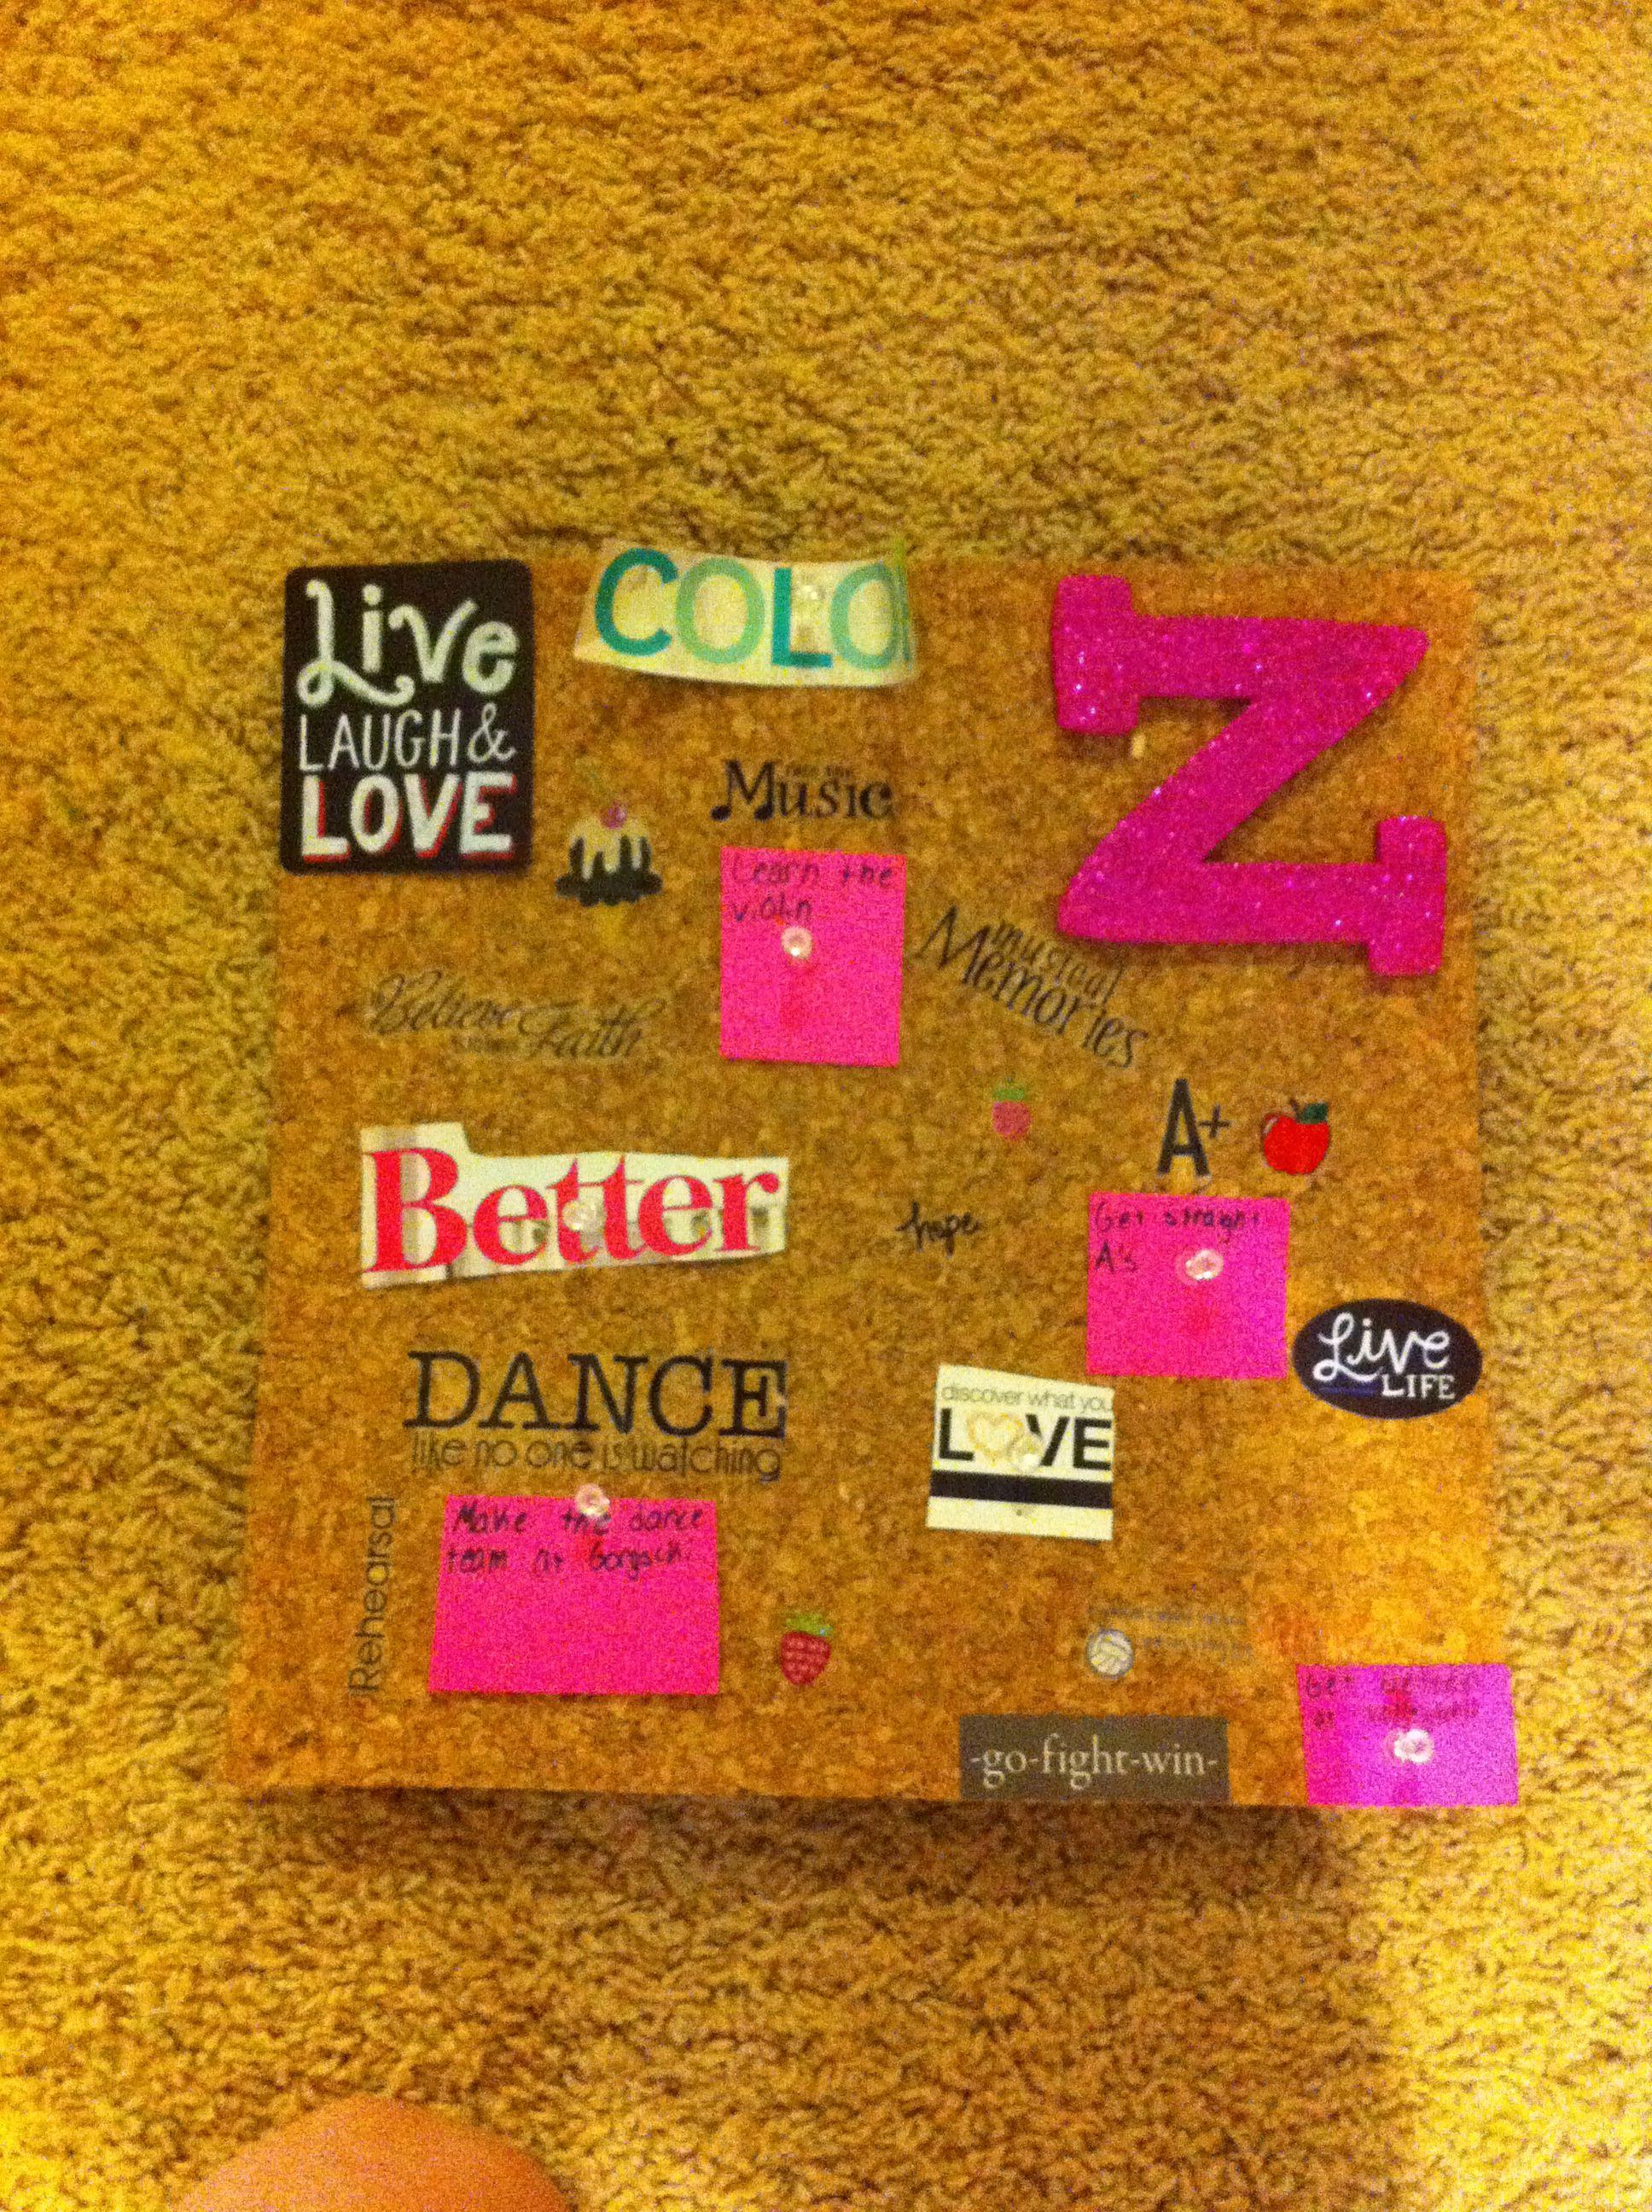 Cute wish board!